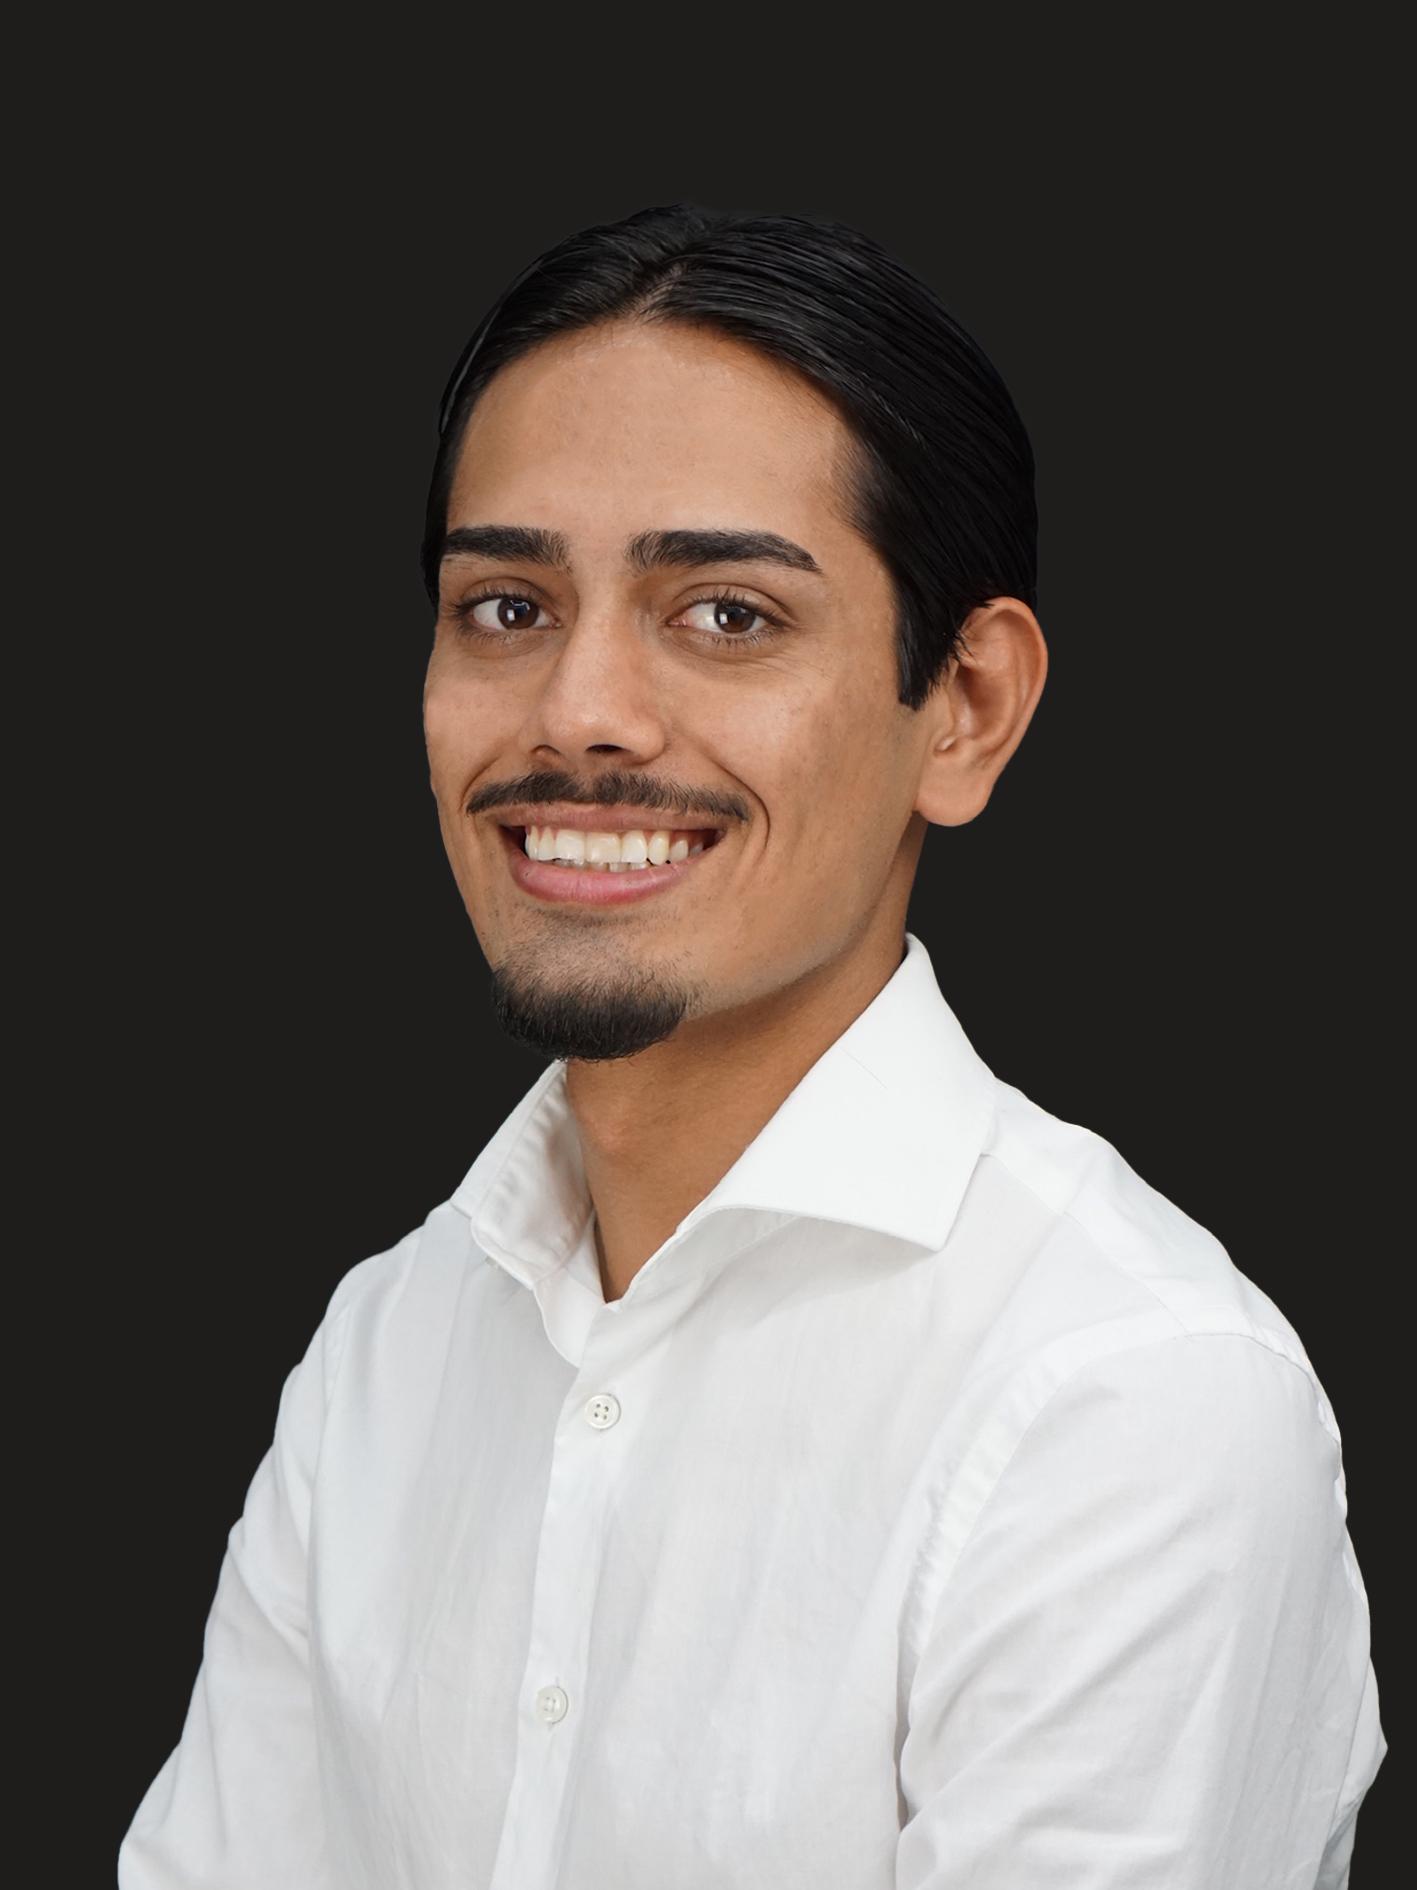 Nazir Amiri